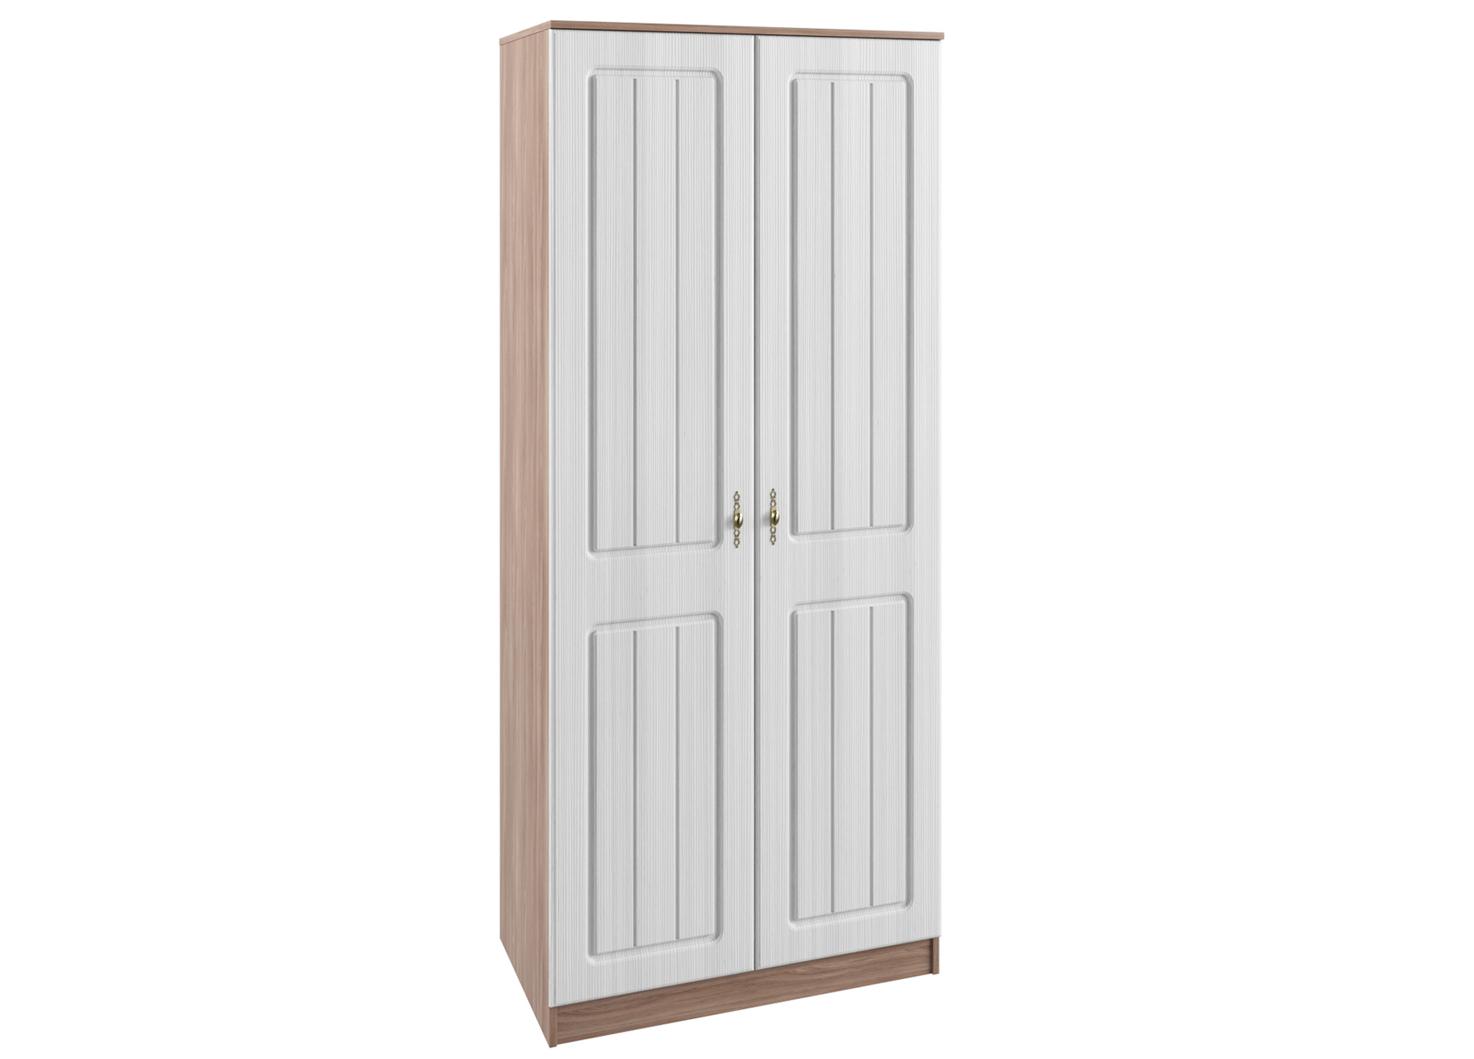 Шкаф 2-х дверный Ницца 900.1 для платья